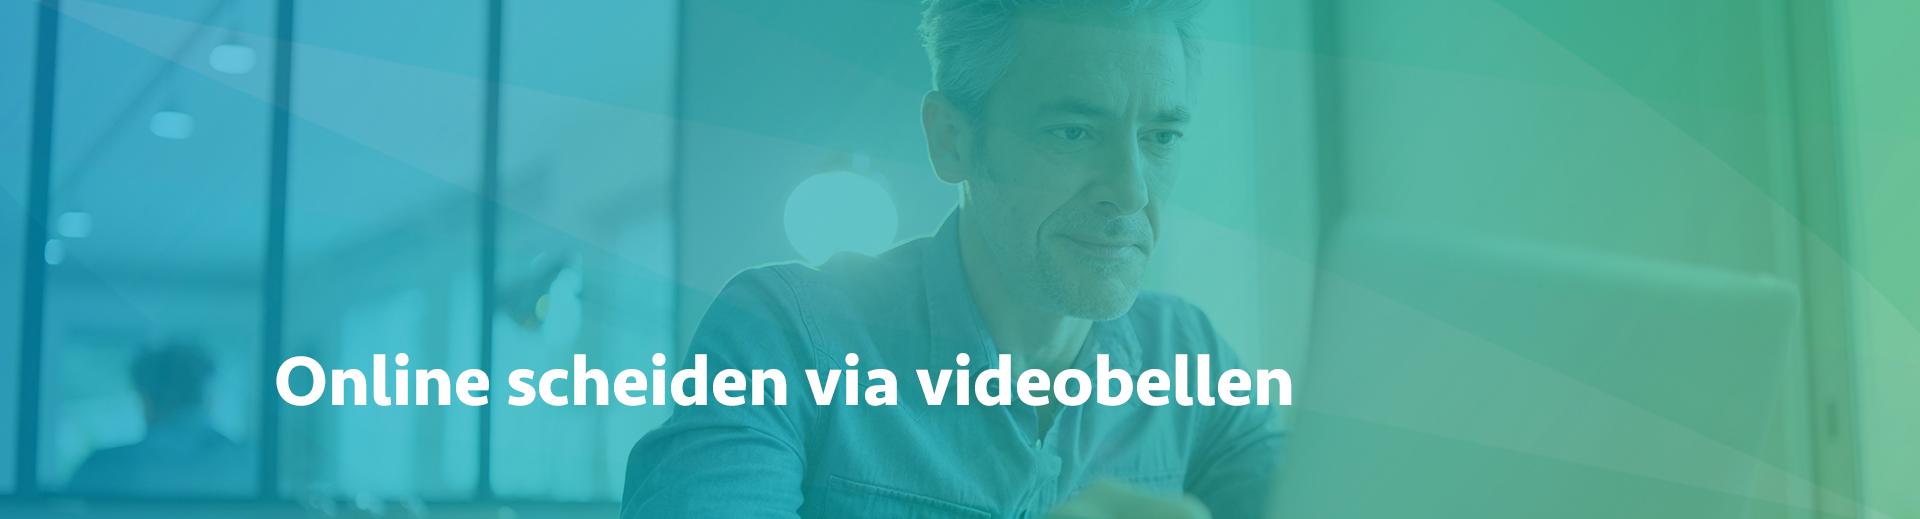 Online scheiden via videobellen